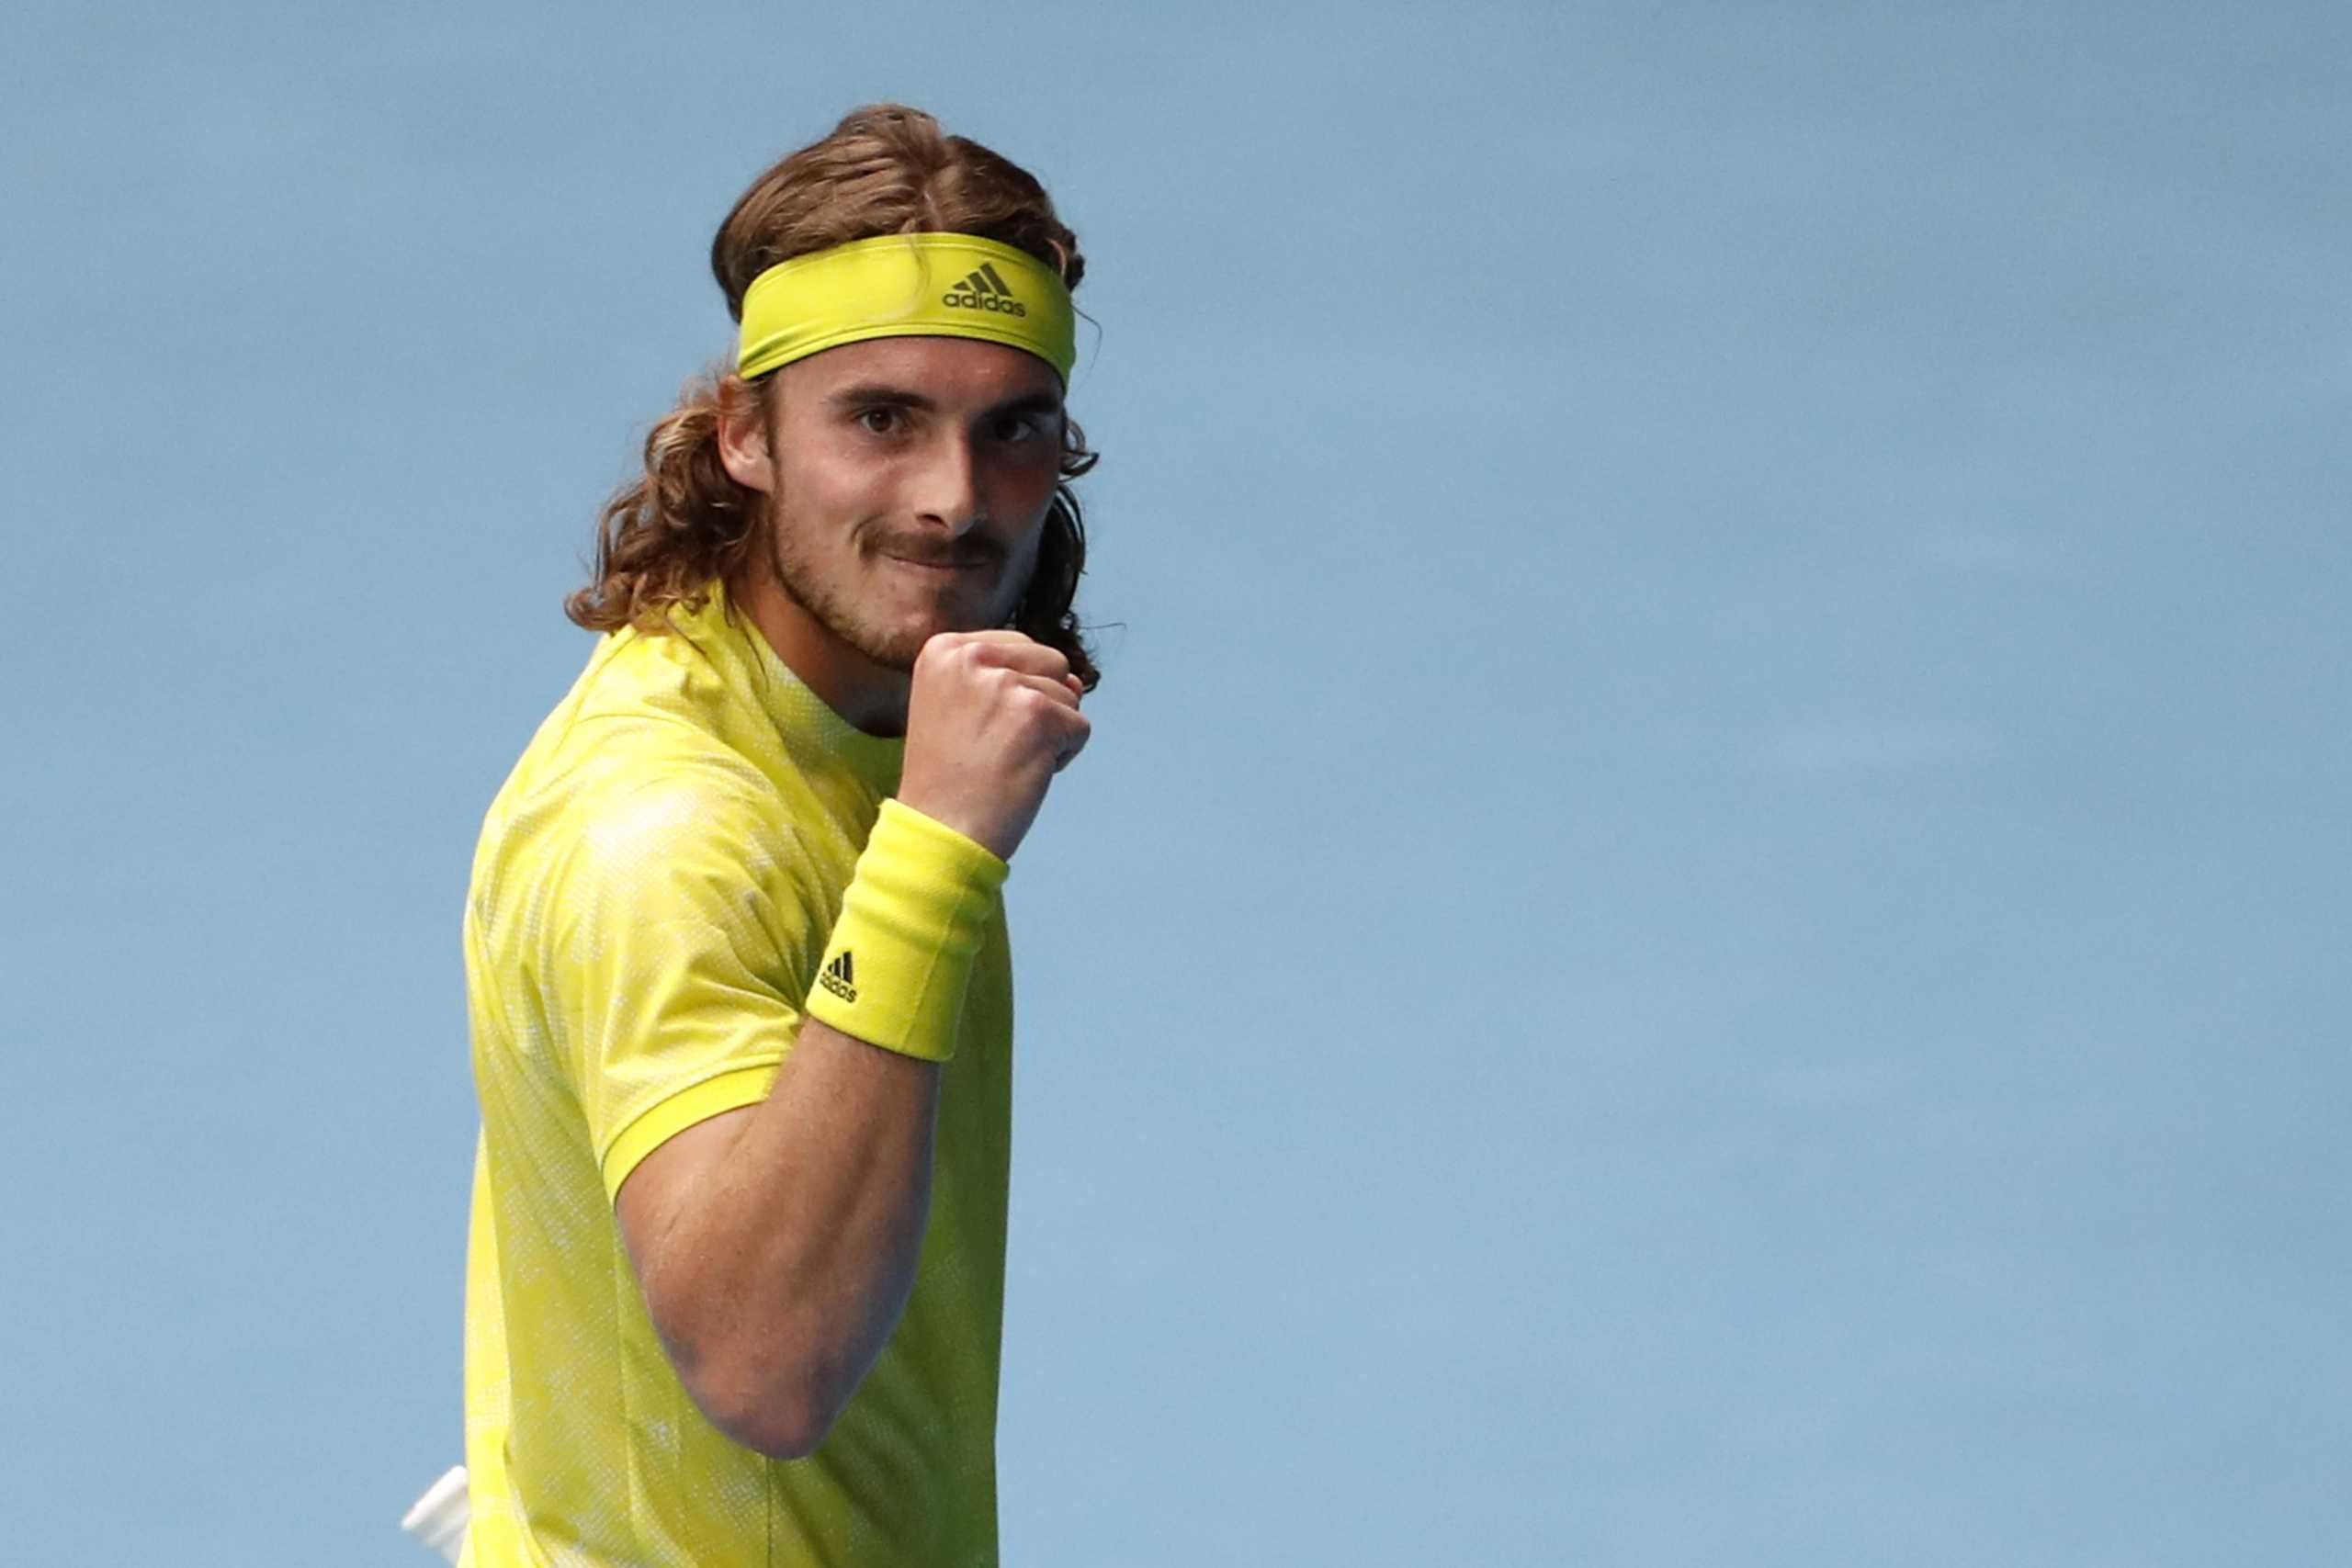 Australian Open: Προκρίθηκε χωρίς αγώνα ο Τσιτσιπάς